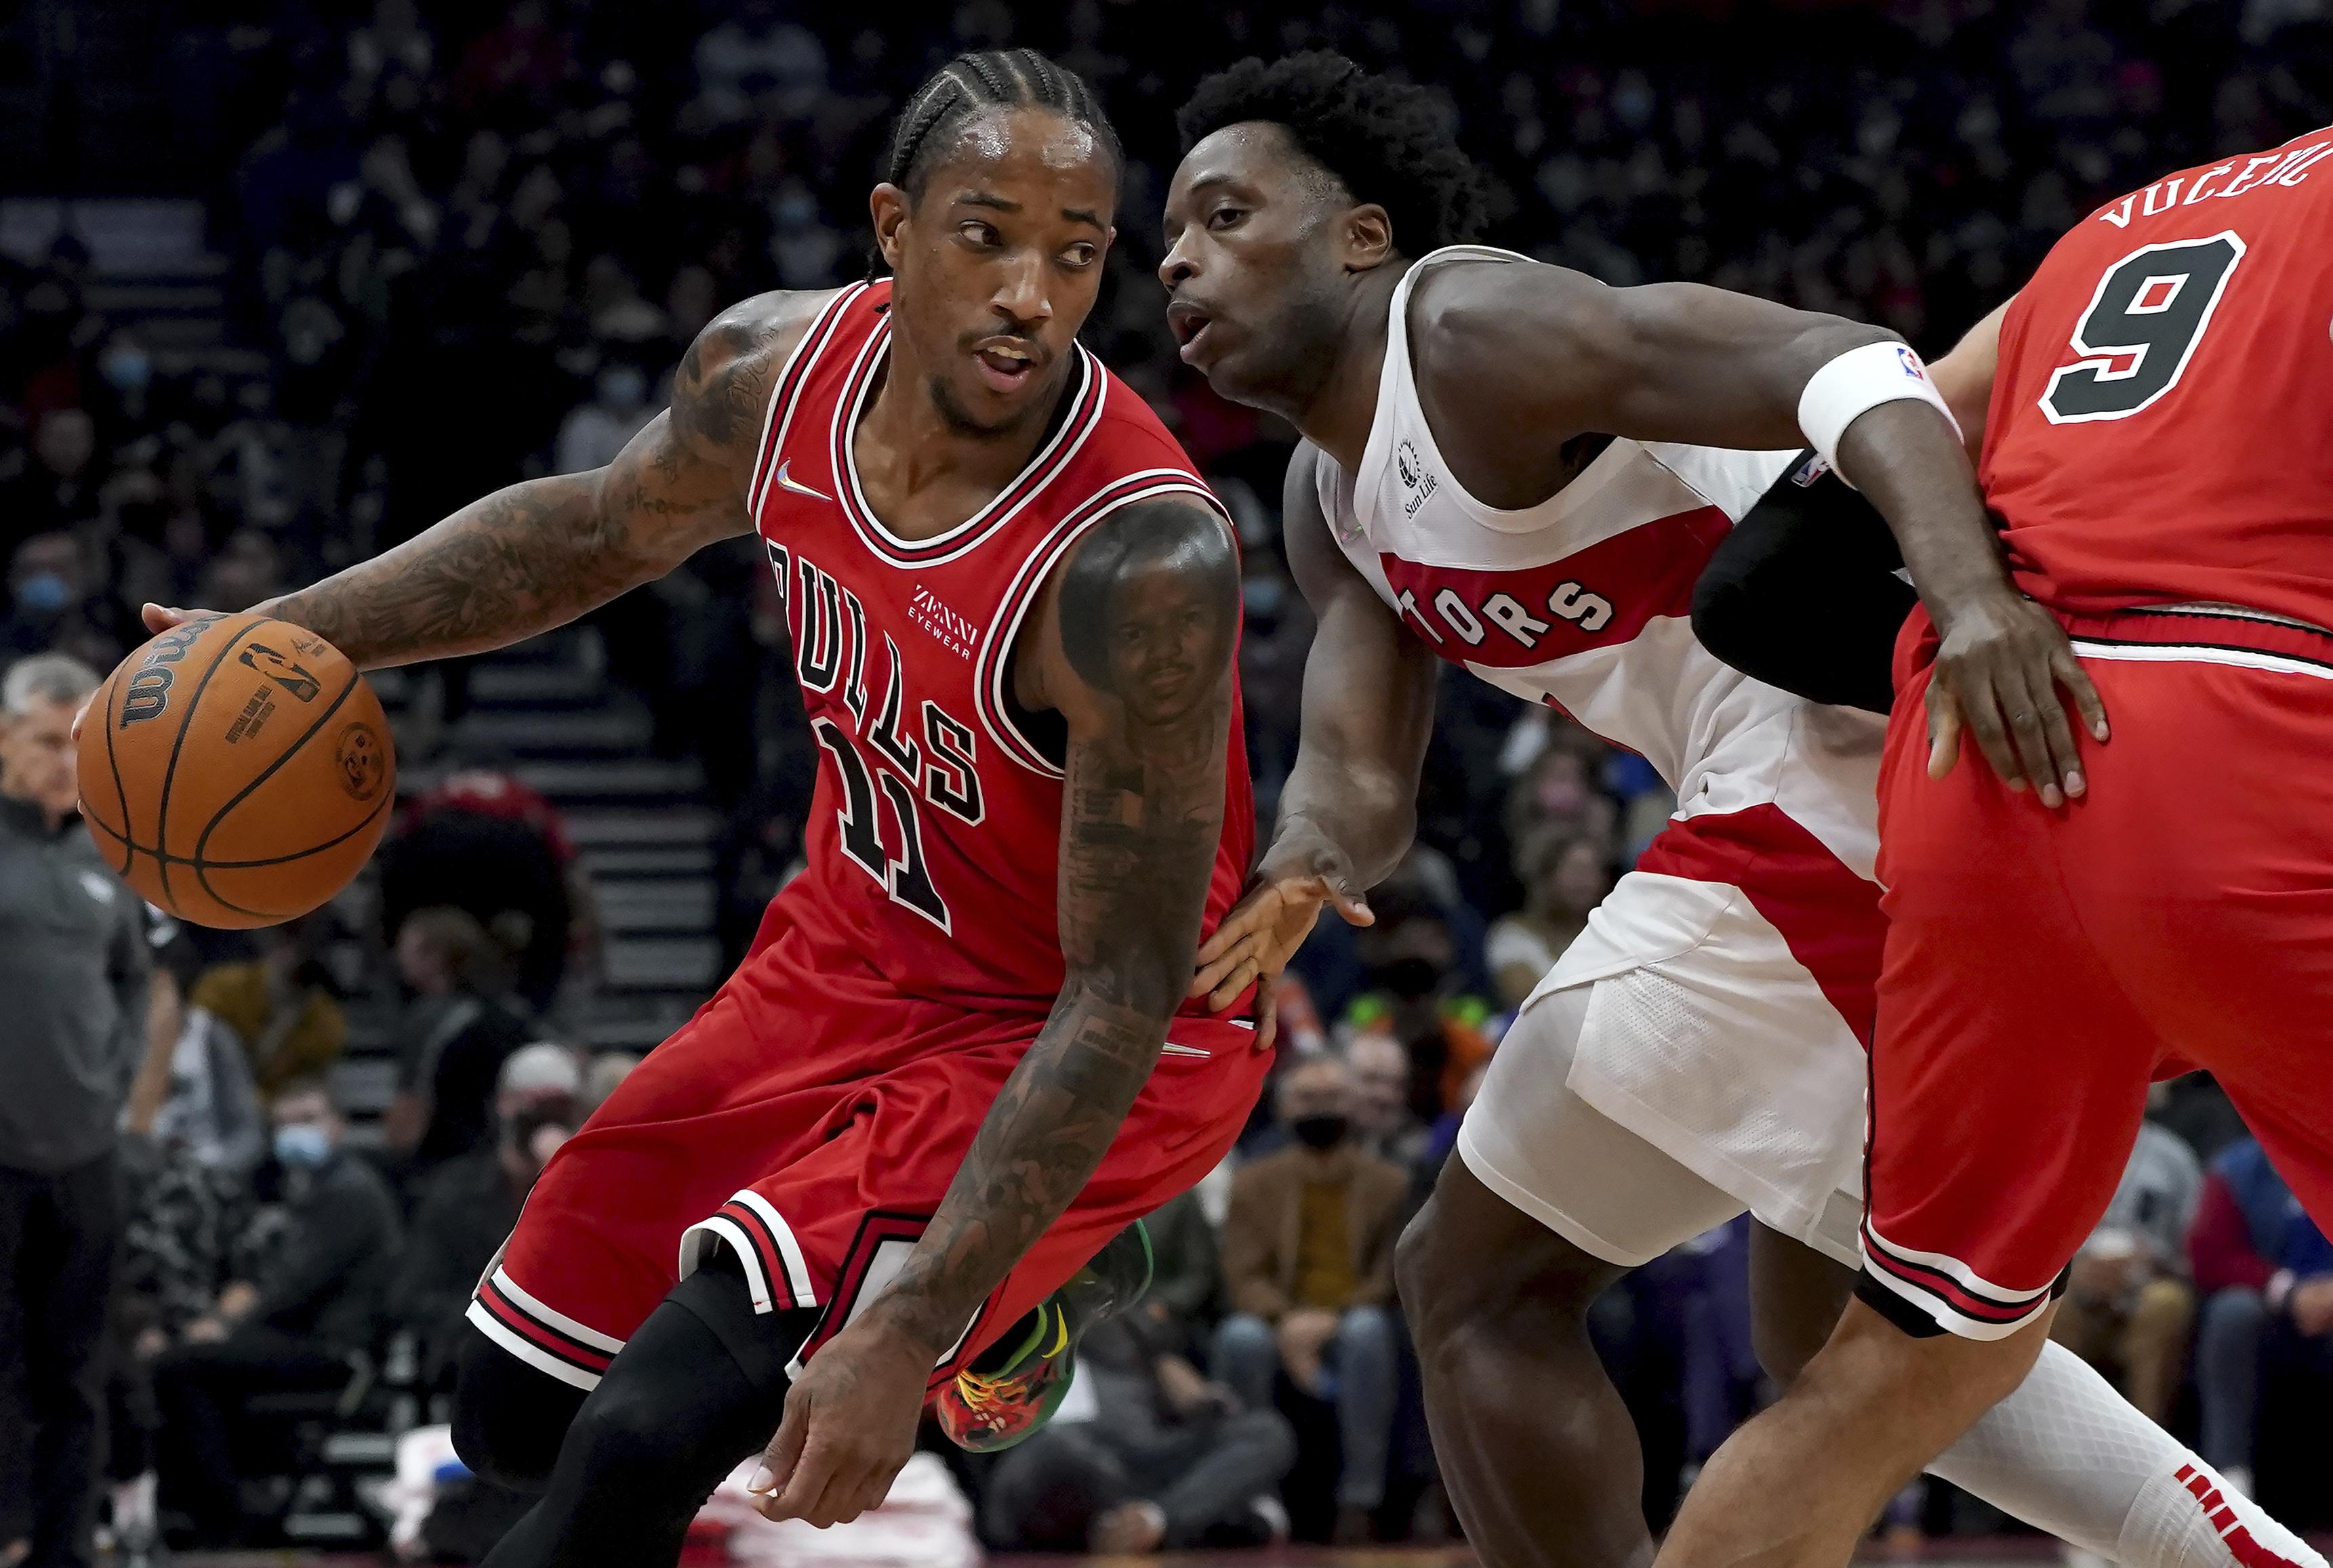 Bulls forward DeMar DeRozan moves around Toronto Raptors forward OG Anunoby.